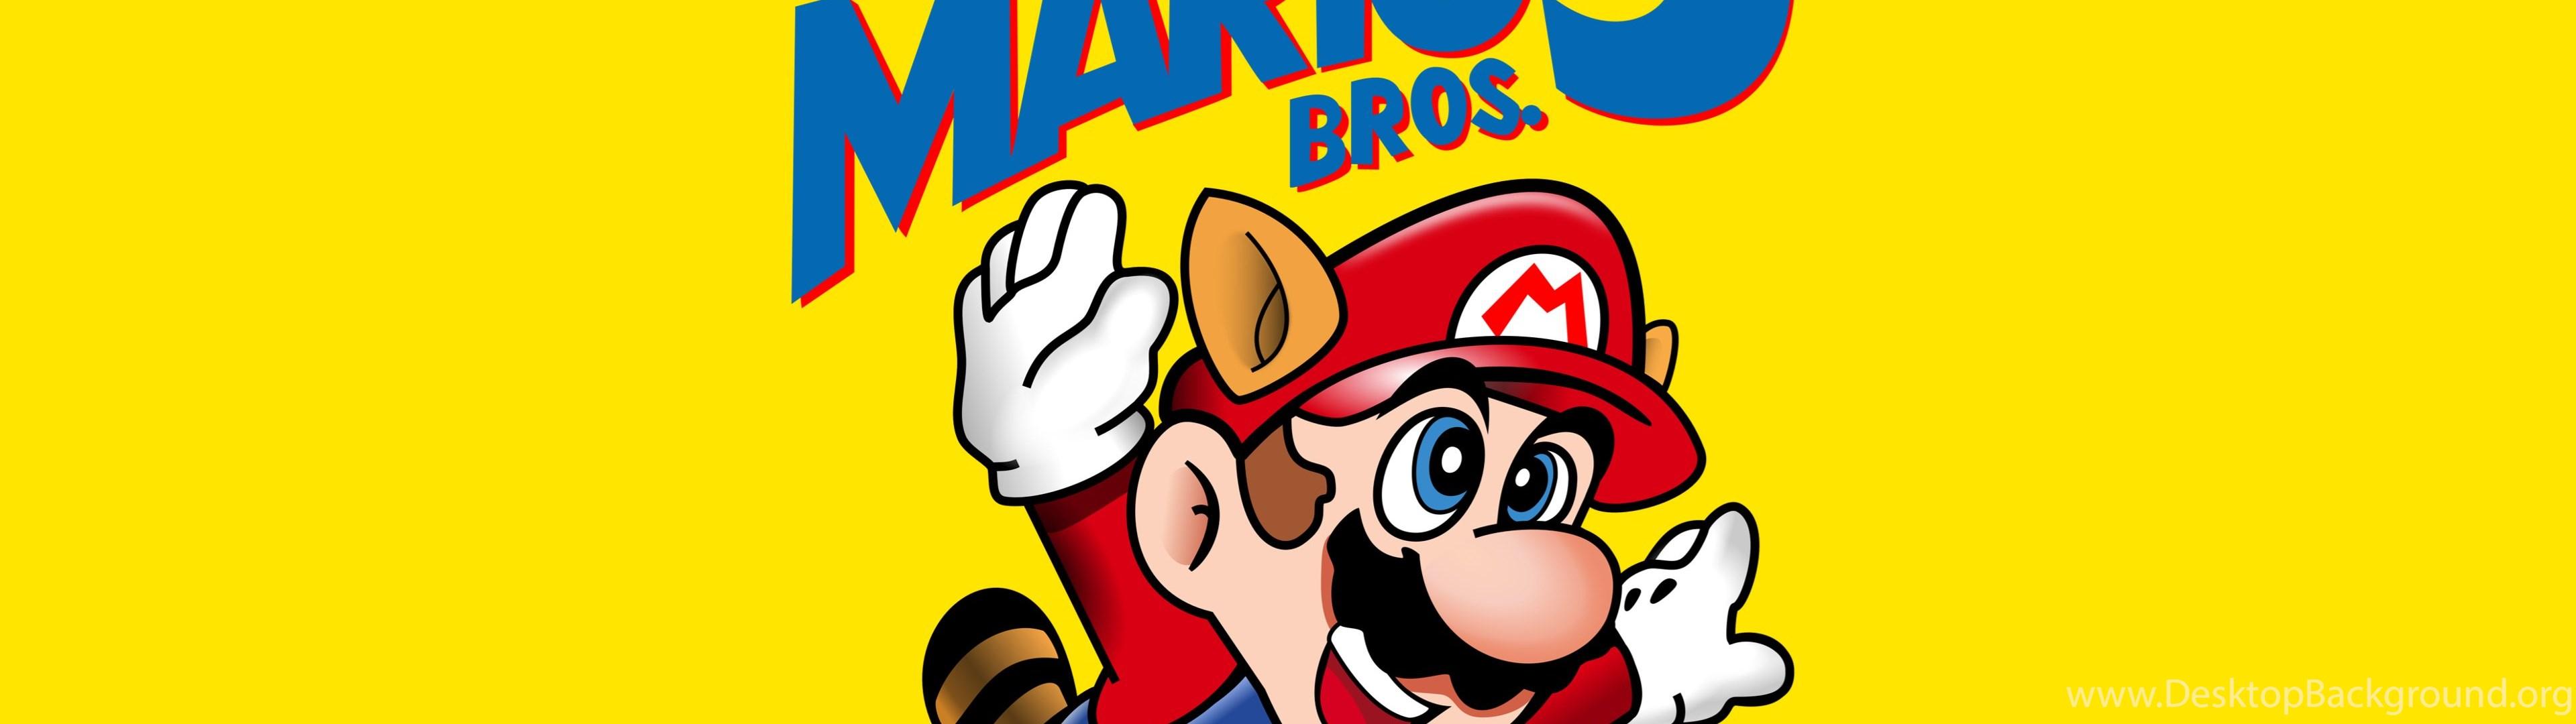 Super Mario Bros 3 Wallpapers By Fistfulofyoshi On Deviantart